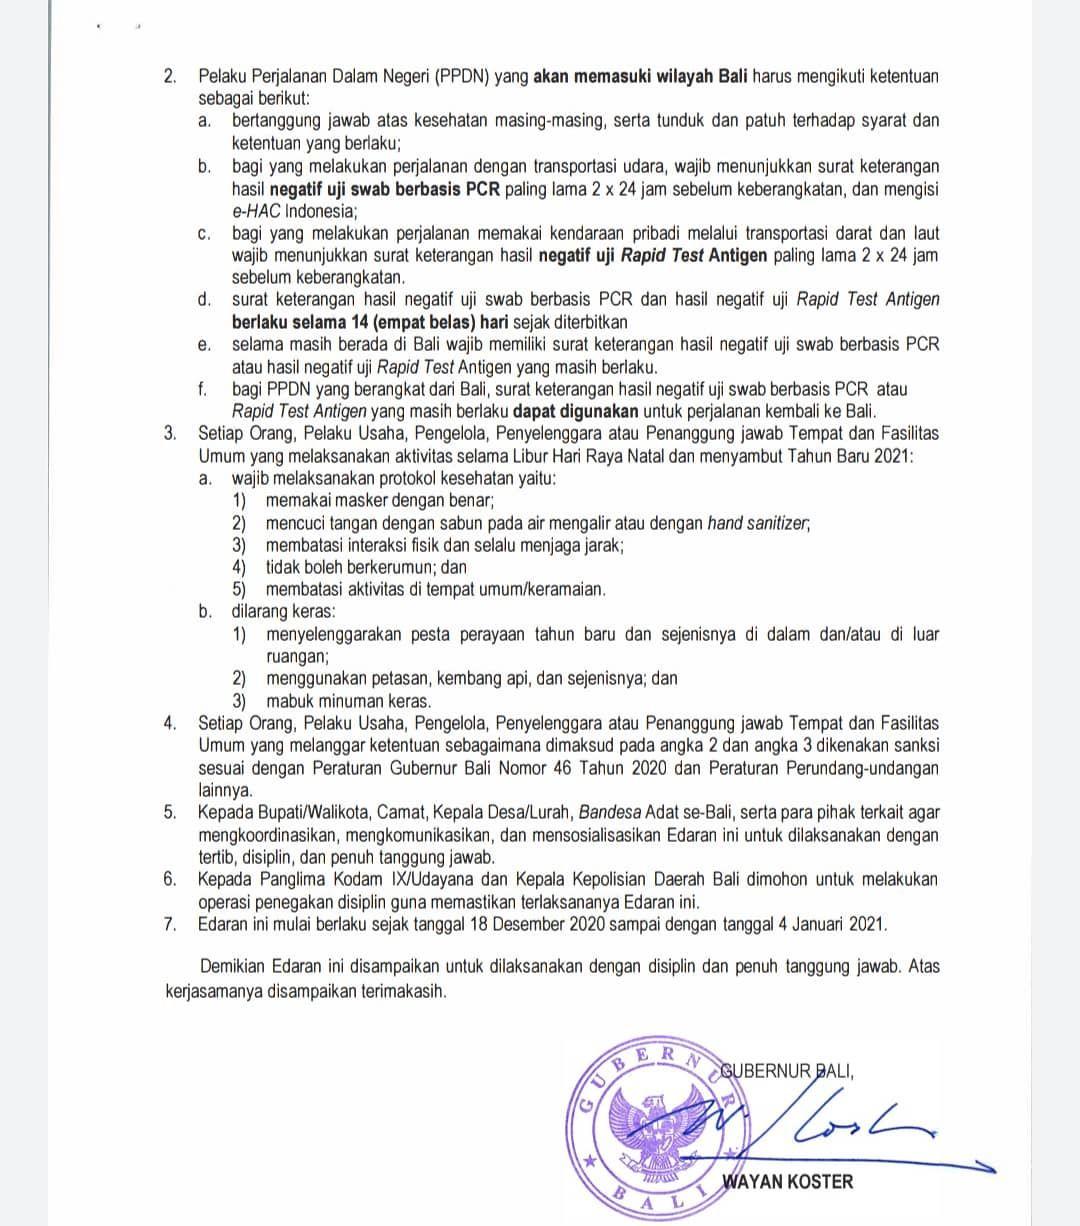 Gubernur Bali Wayan Koster mengeluarkan surat edaran yang mewajibkan wisatawan tes PCR atau Rapid Antigen sebelum masuk Bali. Ini ketentuan selengkapnya.